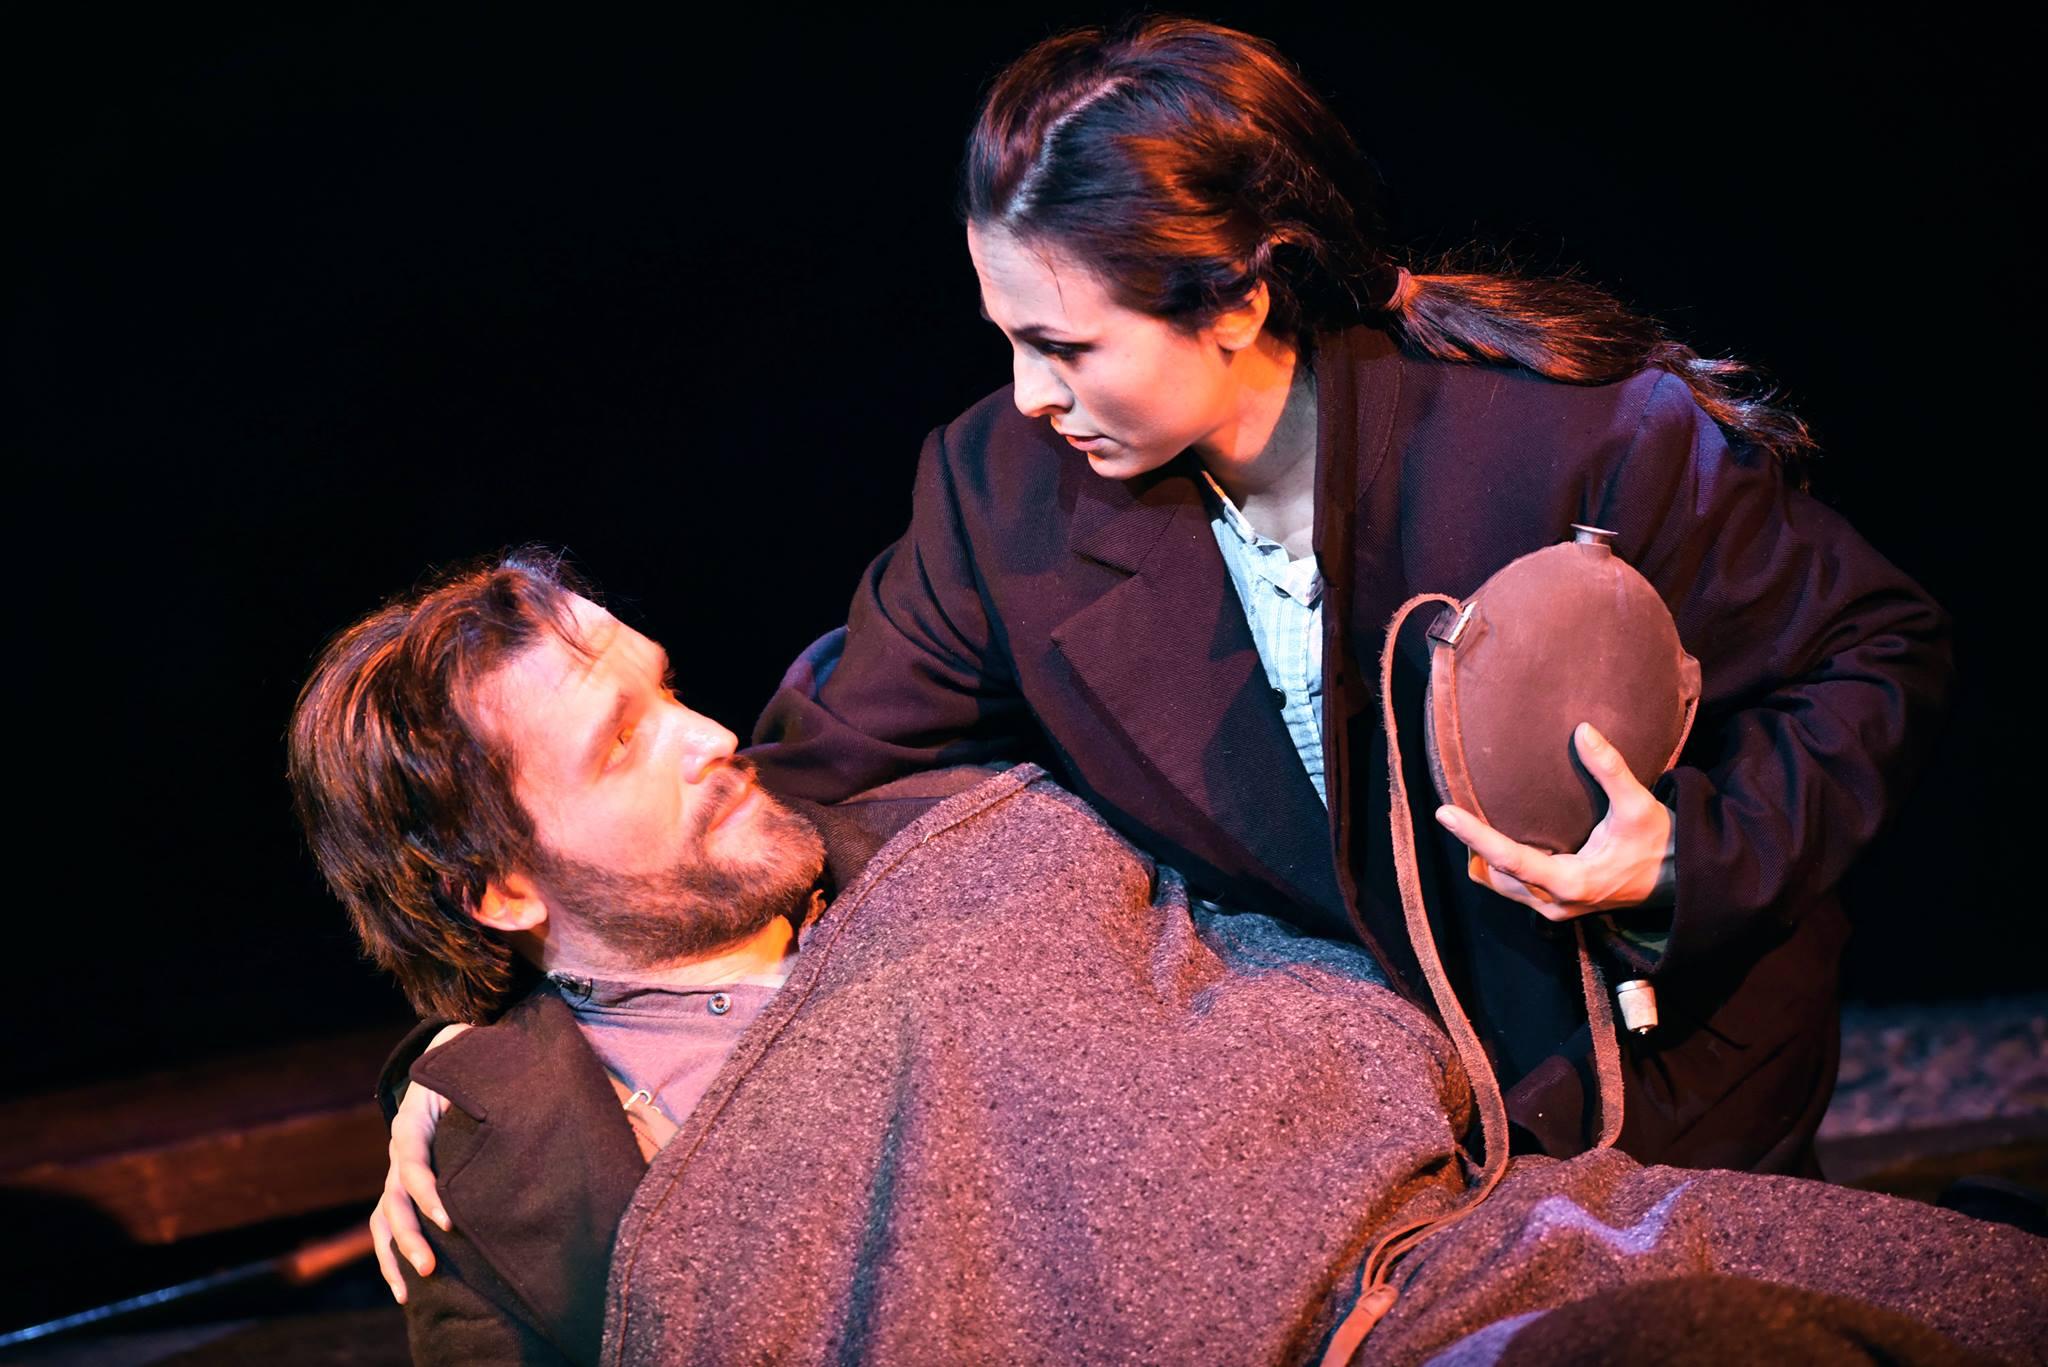 Jarrett as W.P. Inman | Cold Mountain with Opera Philadelphia